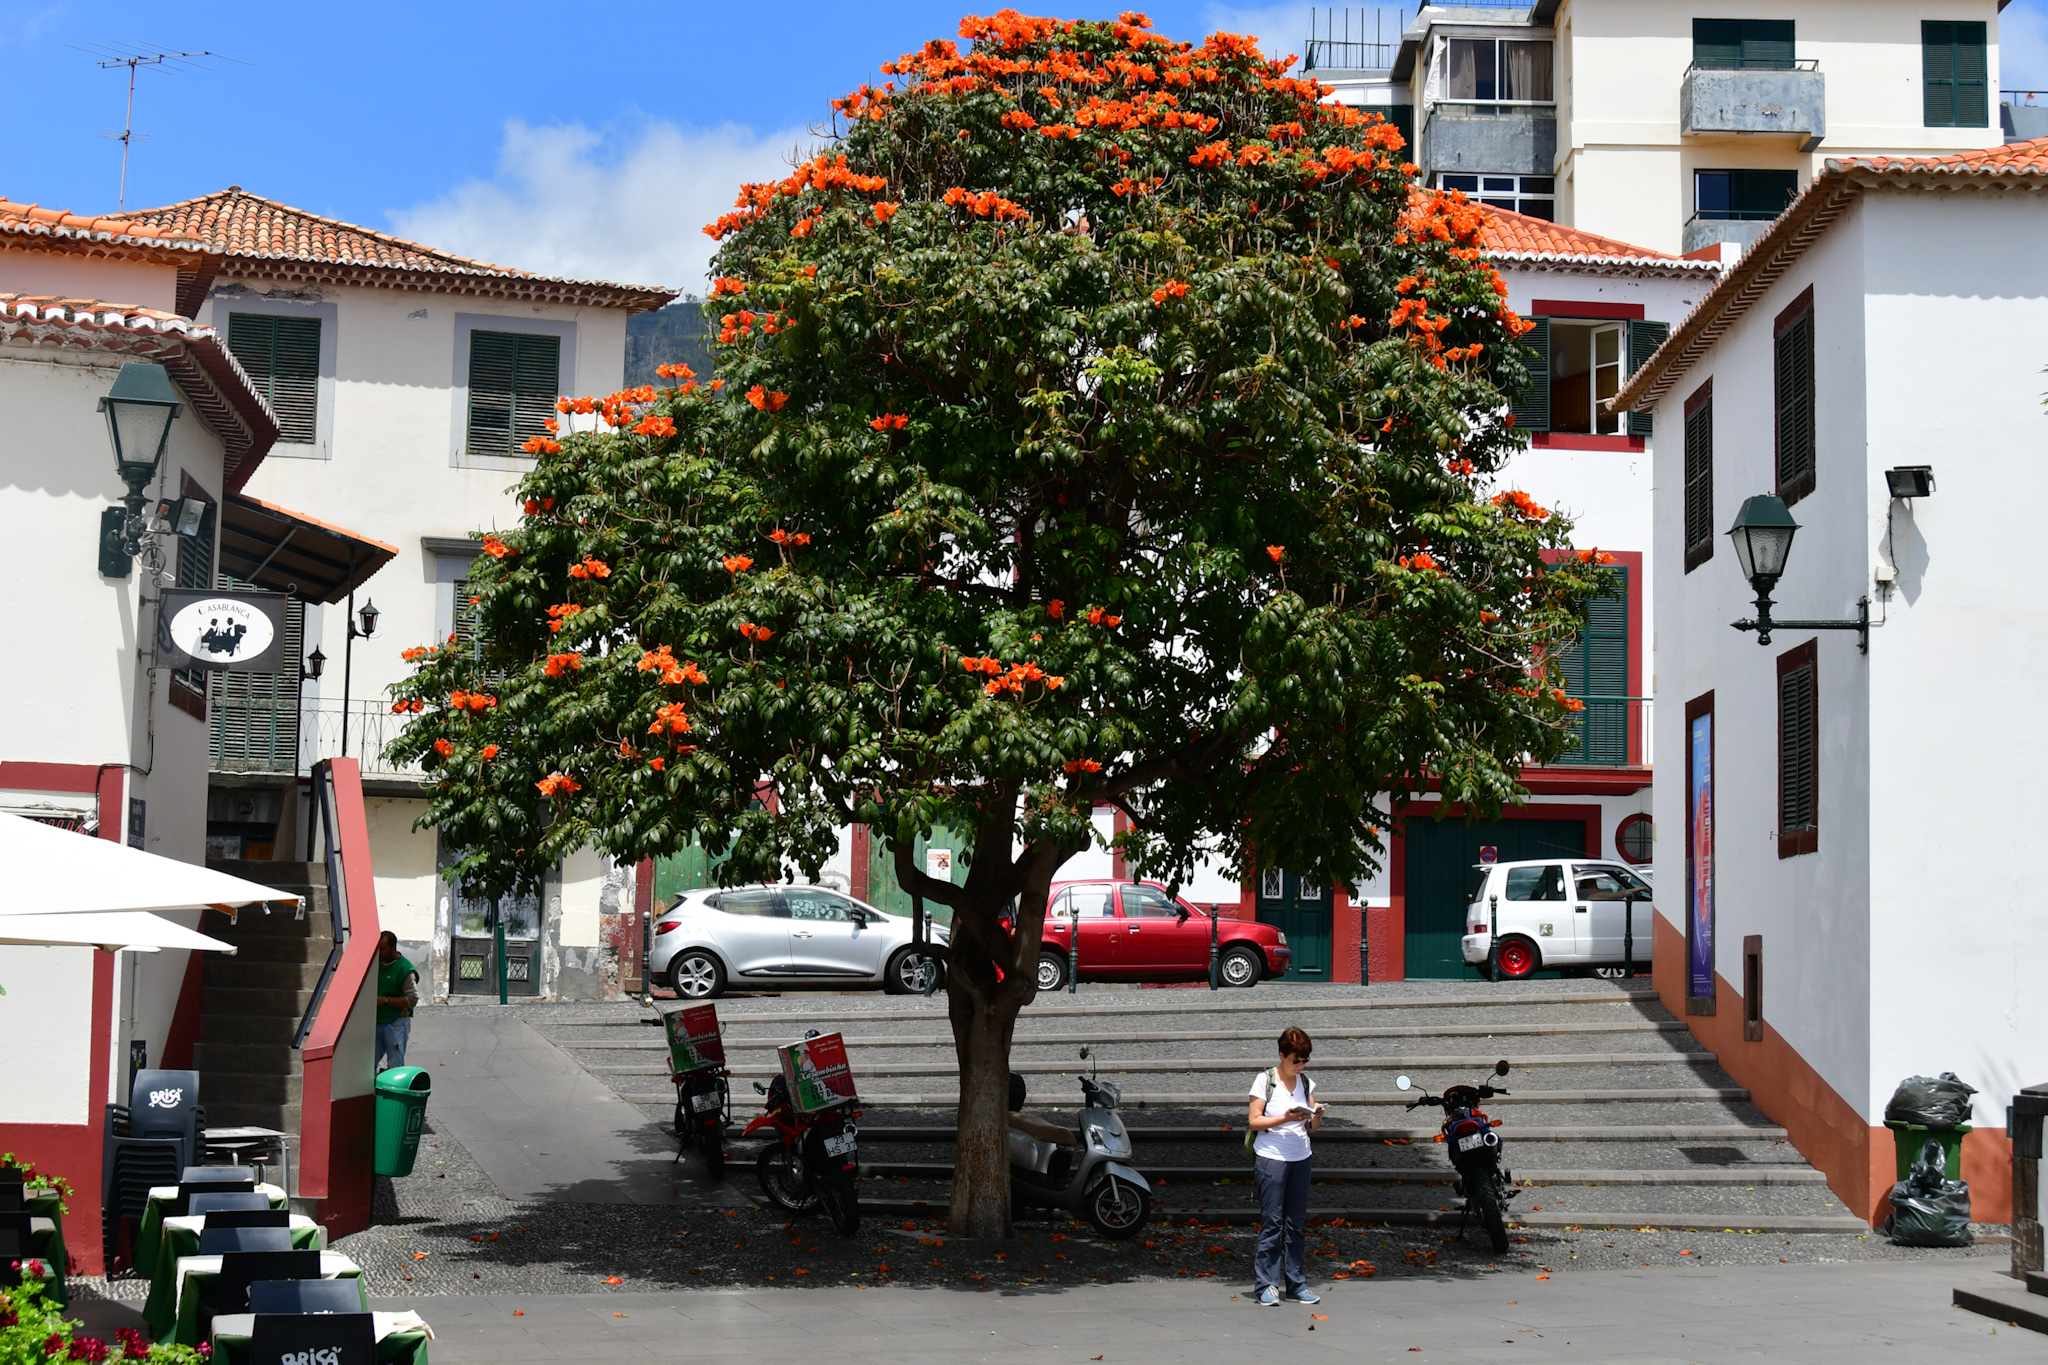 Madeira 20190426 150443